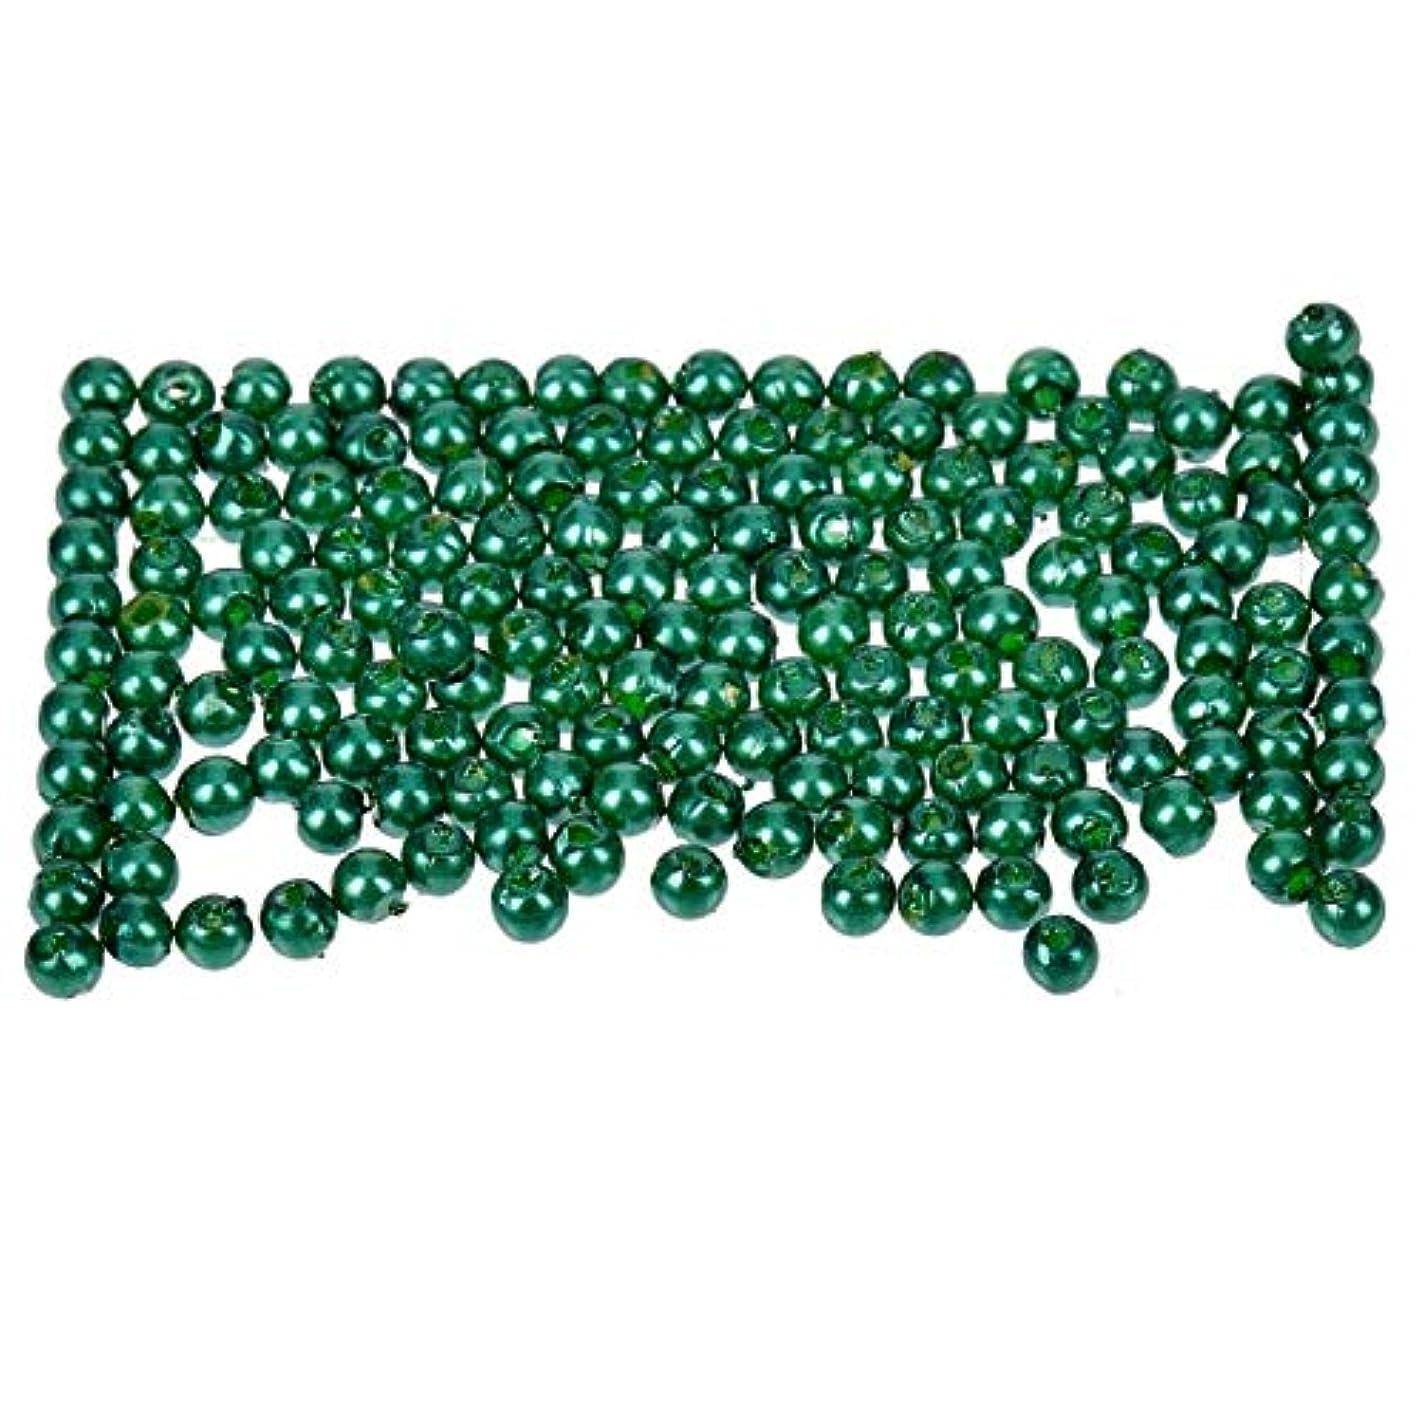 Efco Wax Beads, Plastic, Green, 3 mm Diameter, 125-Piece mai91926606